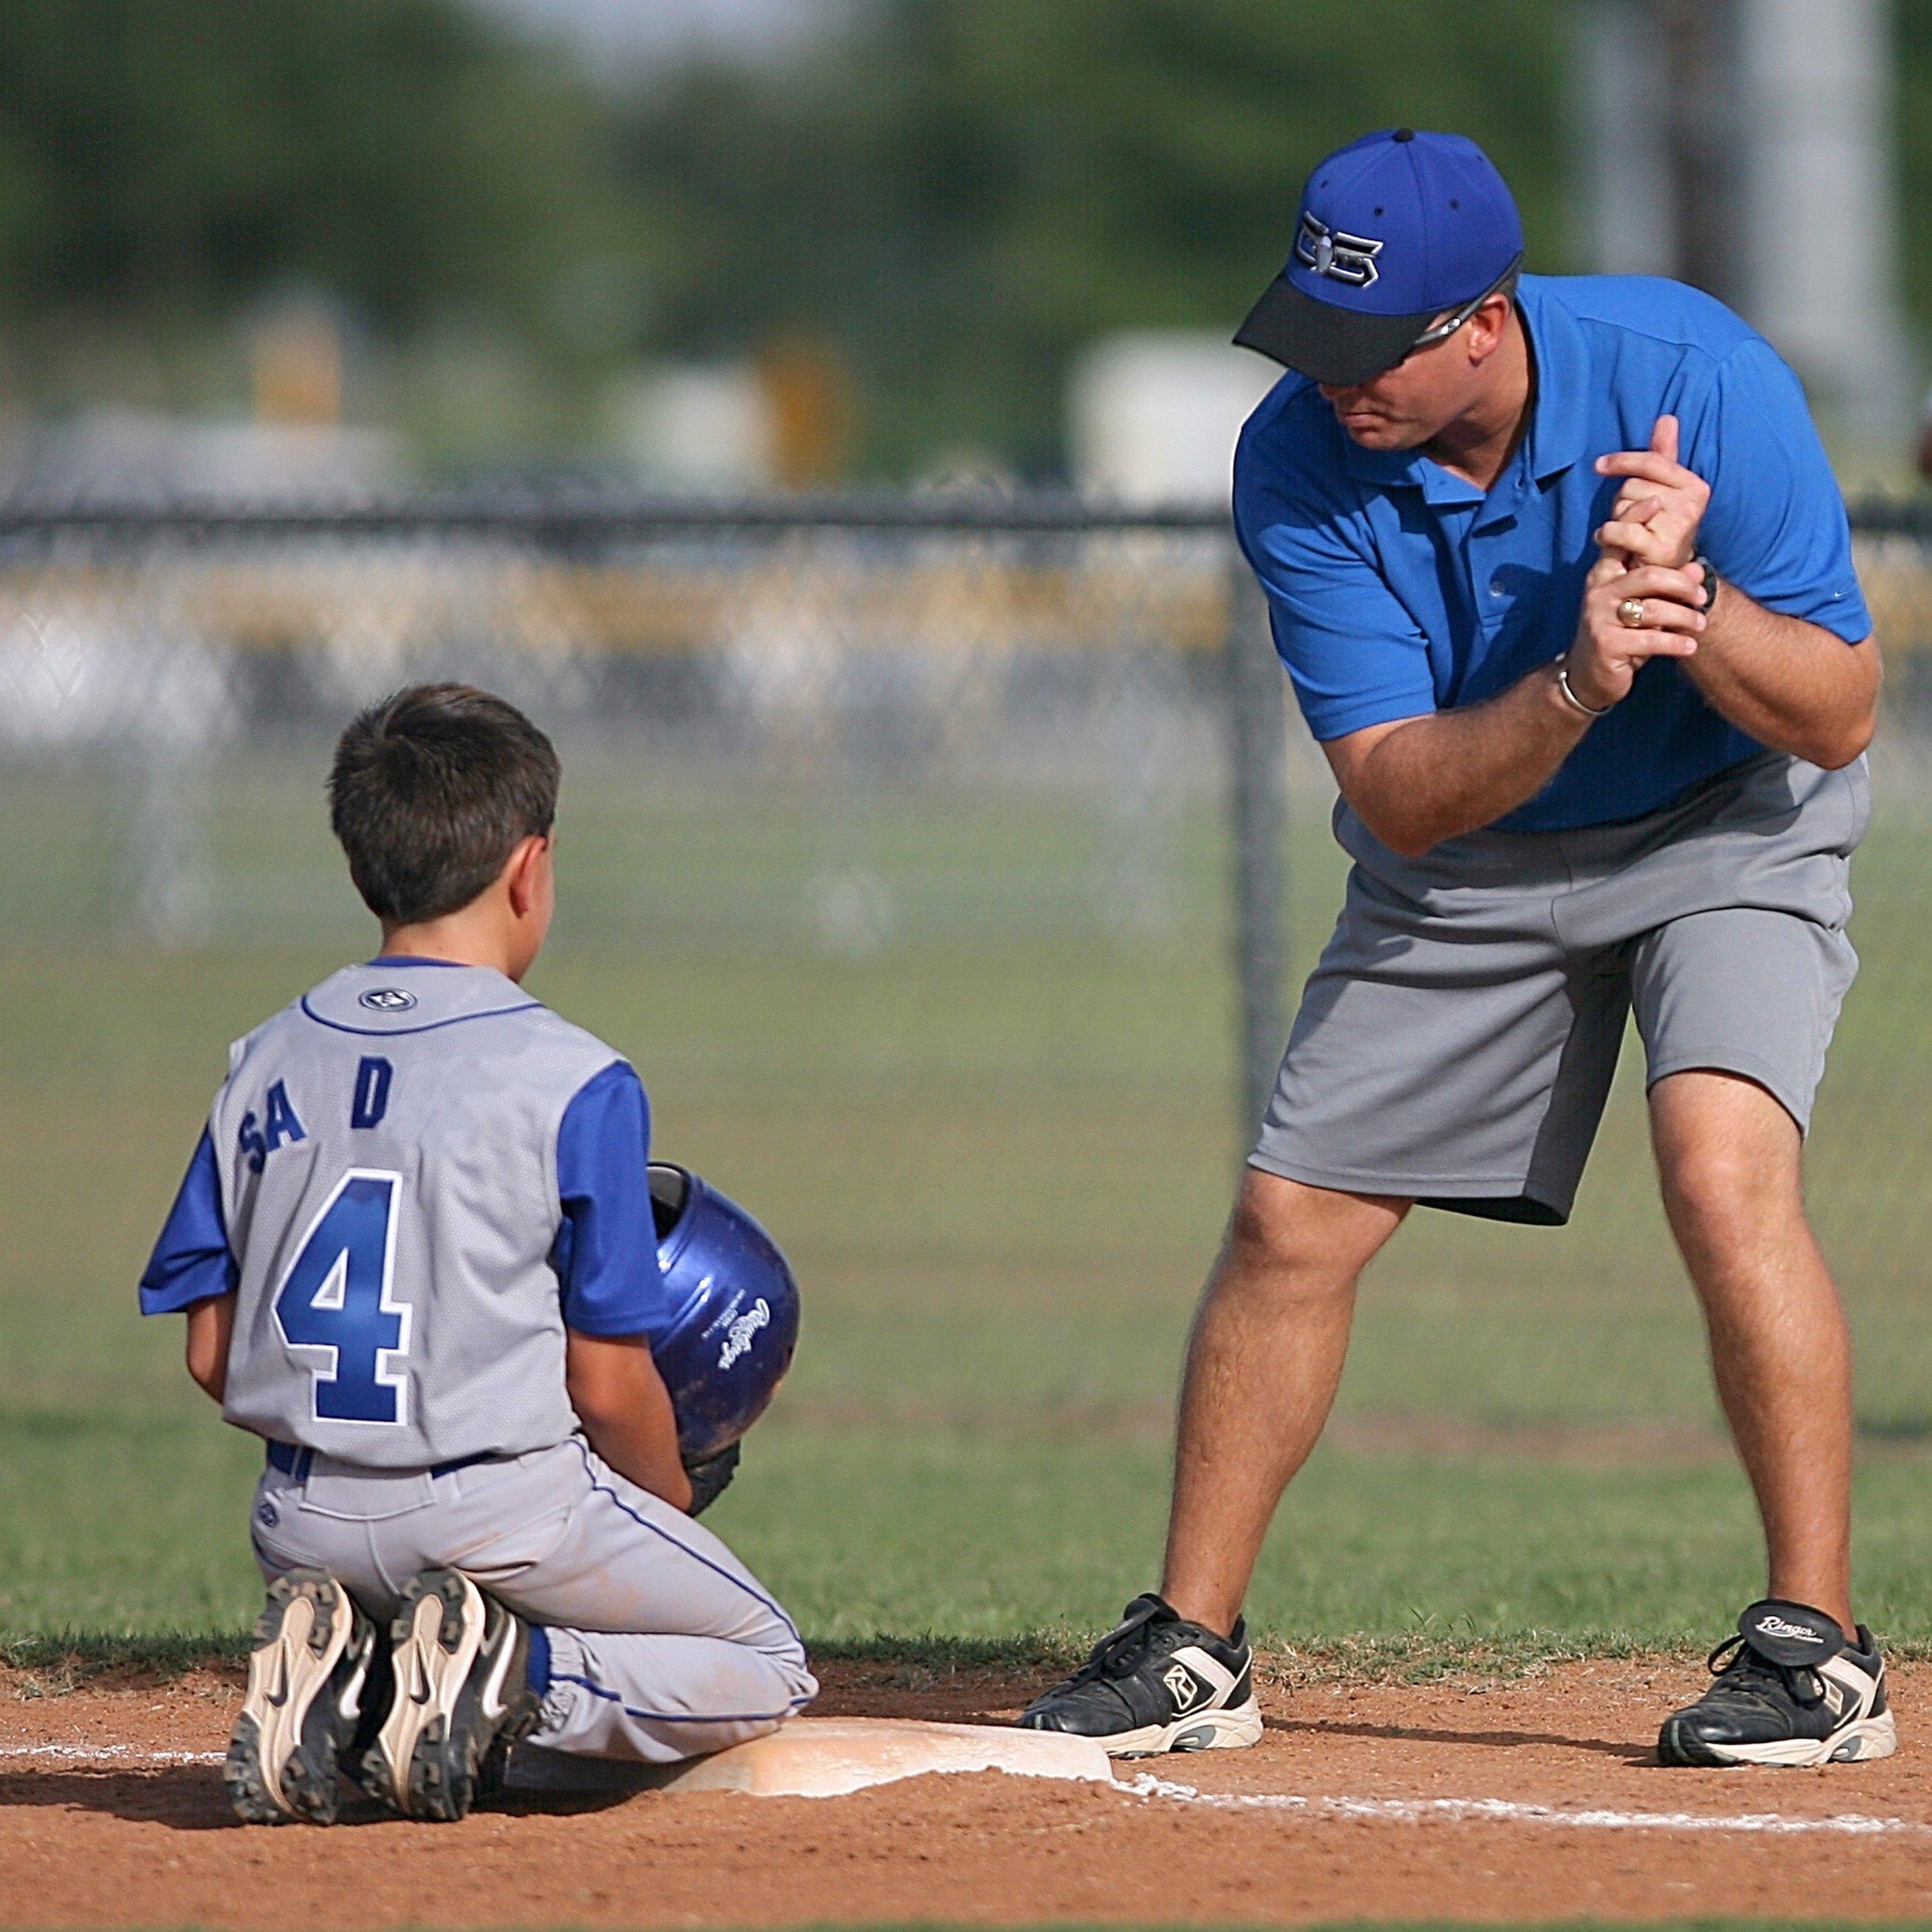 athlete-athletic-baseball-264337.jpg